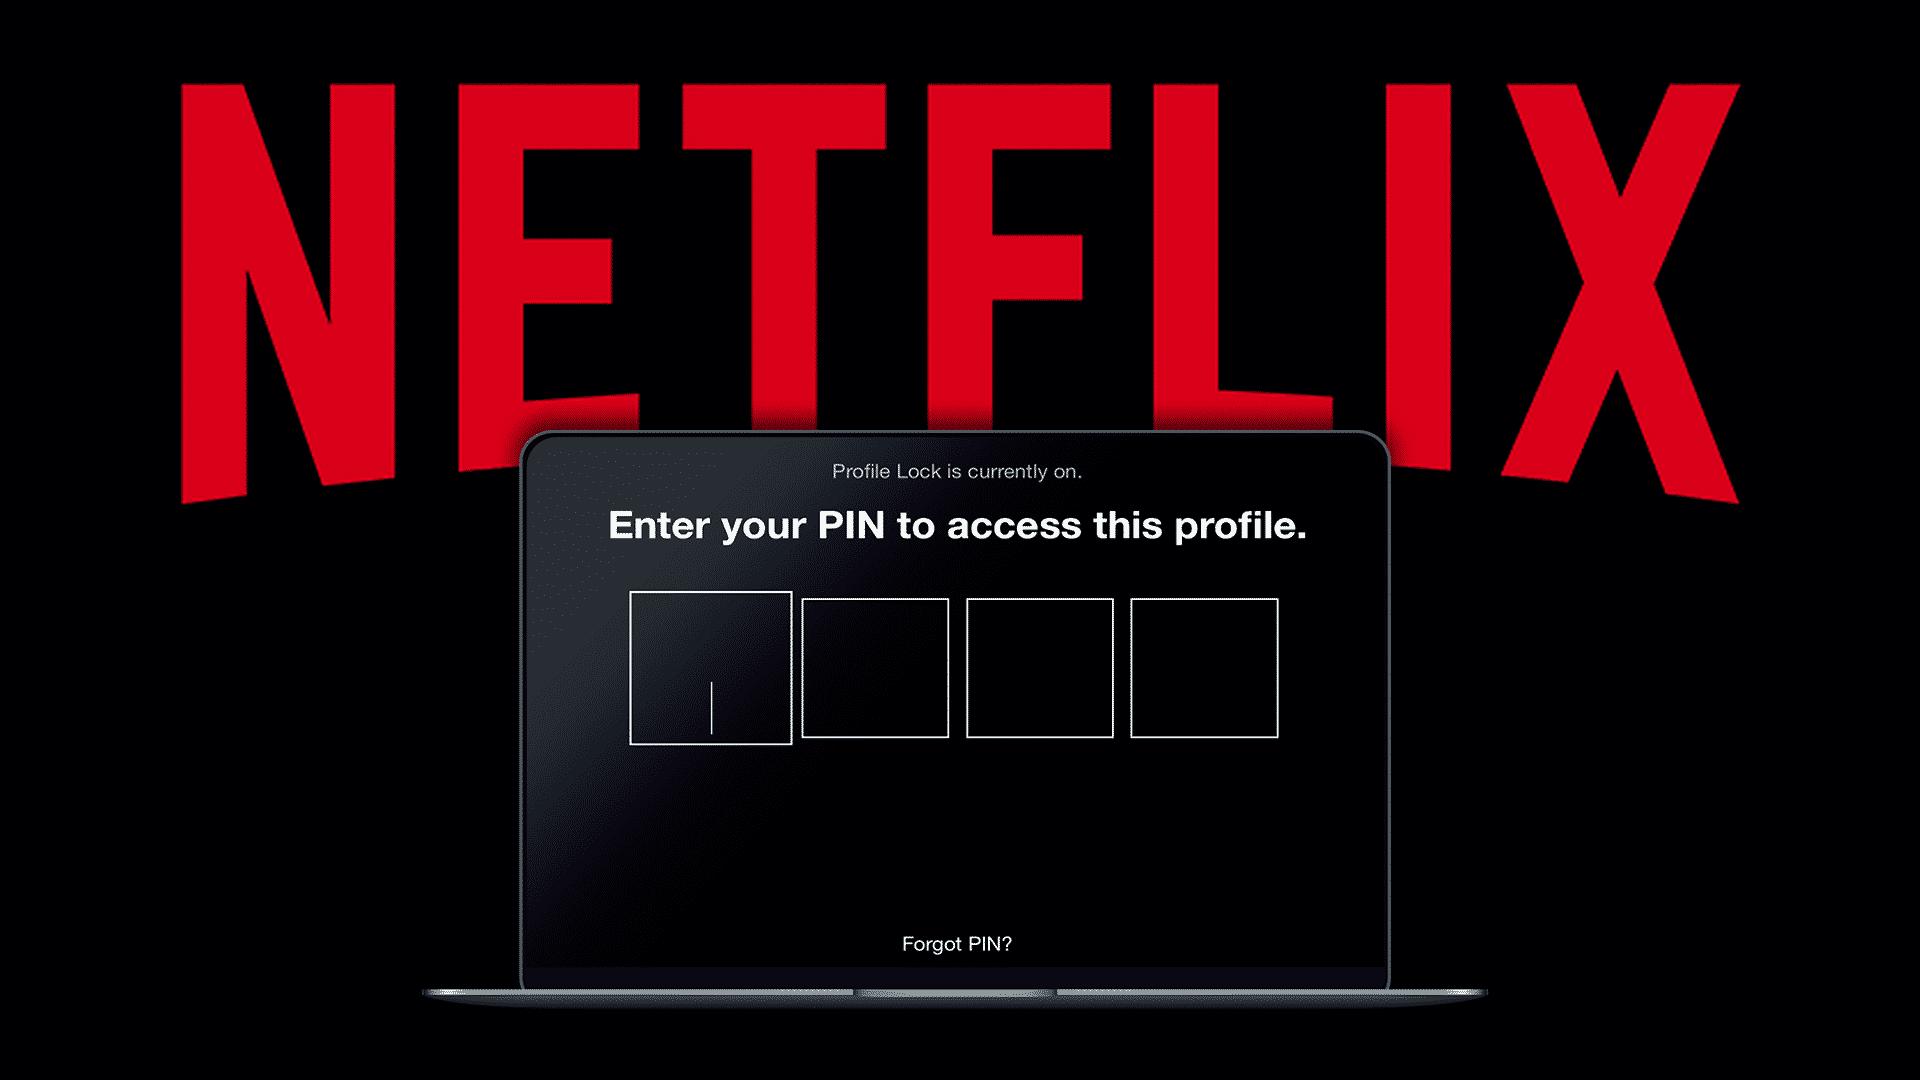 funkcia na Netflixe